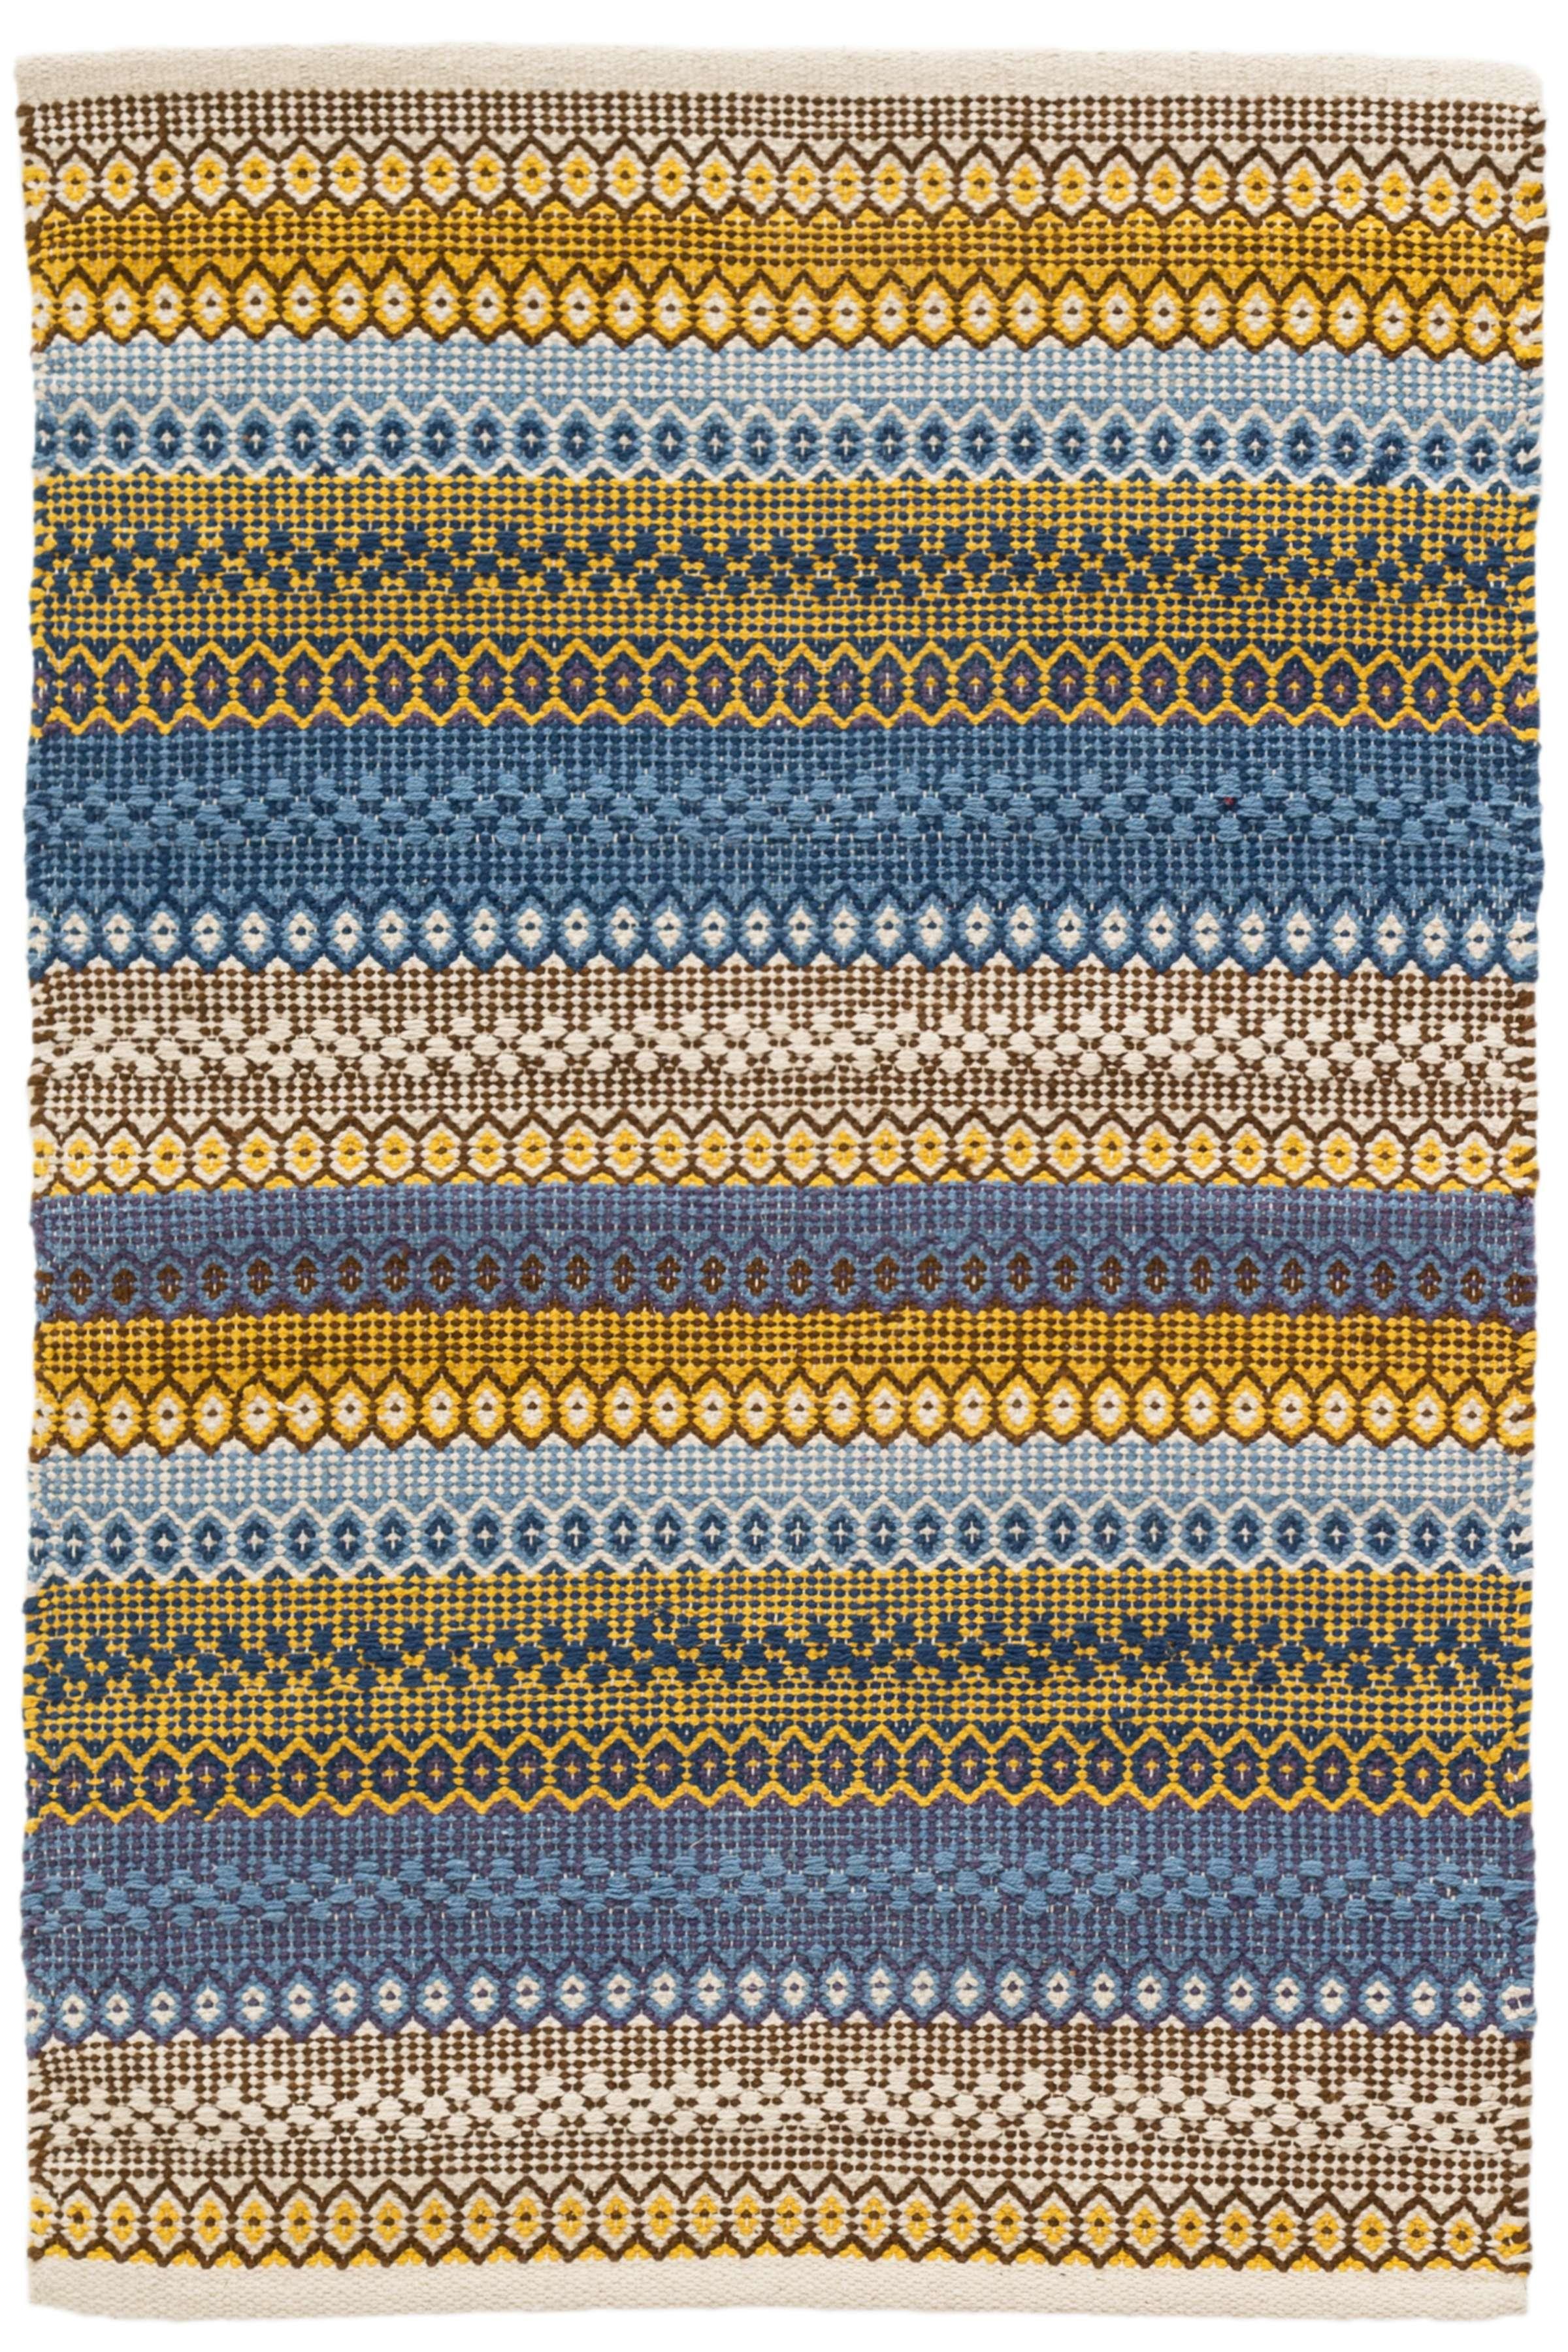 Design Yellow Rug gypsy stripe denimyellow woven cotton rug dash albert